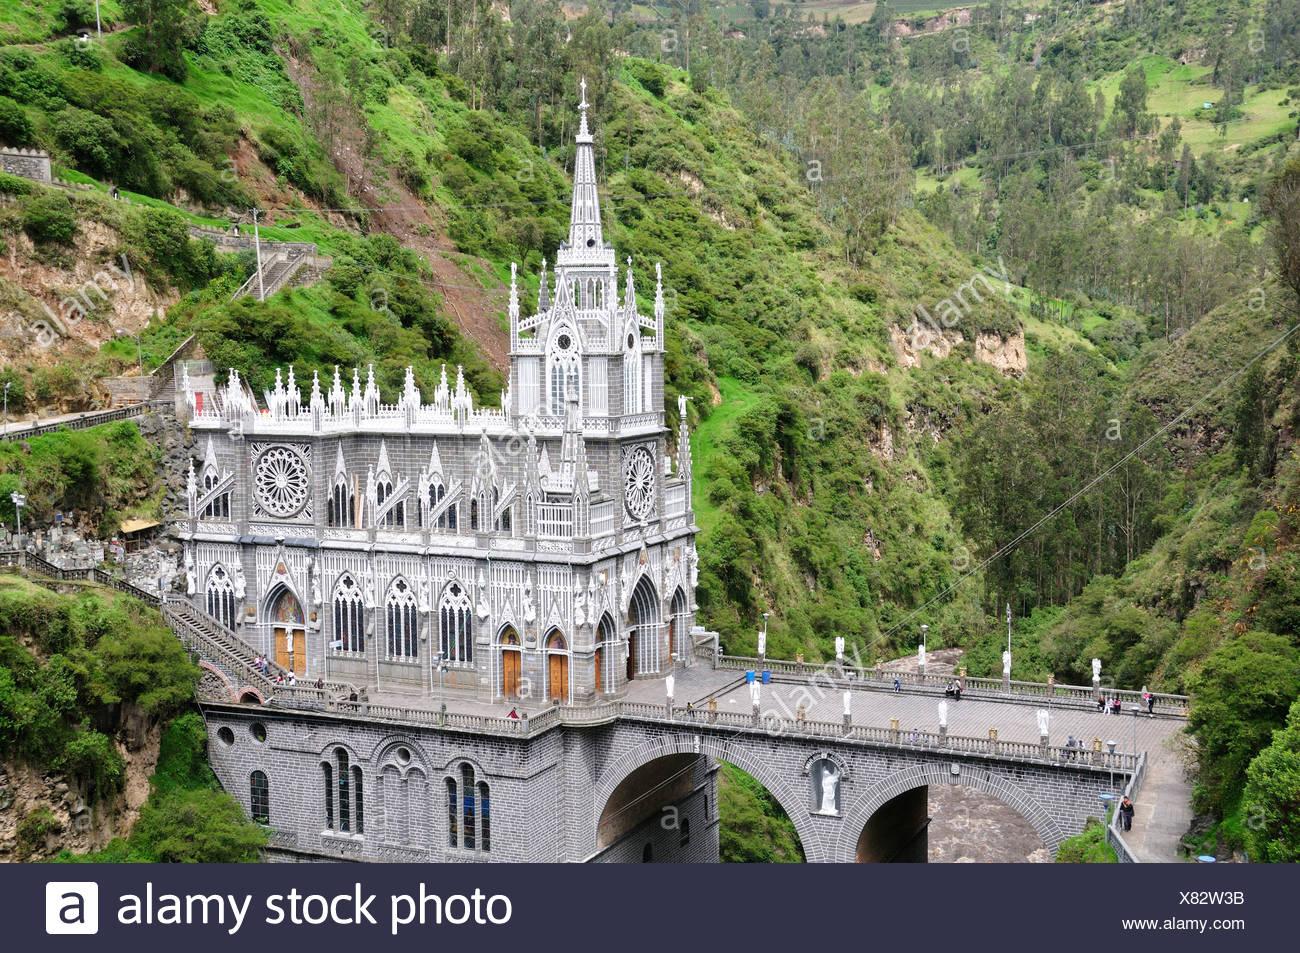 Santuario De Las Lajas Pilgrim Church Gothic Style Las Lajas